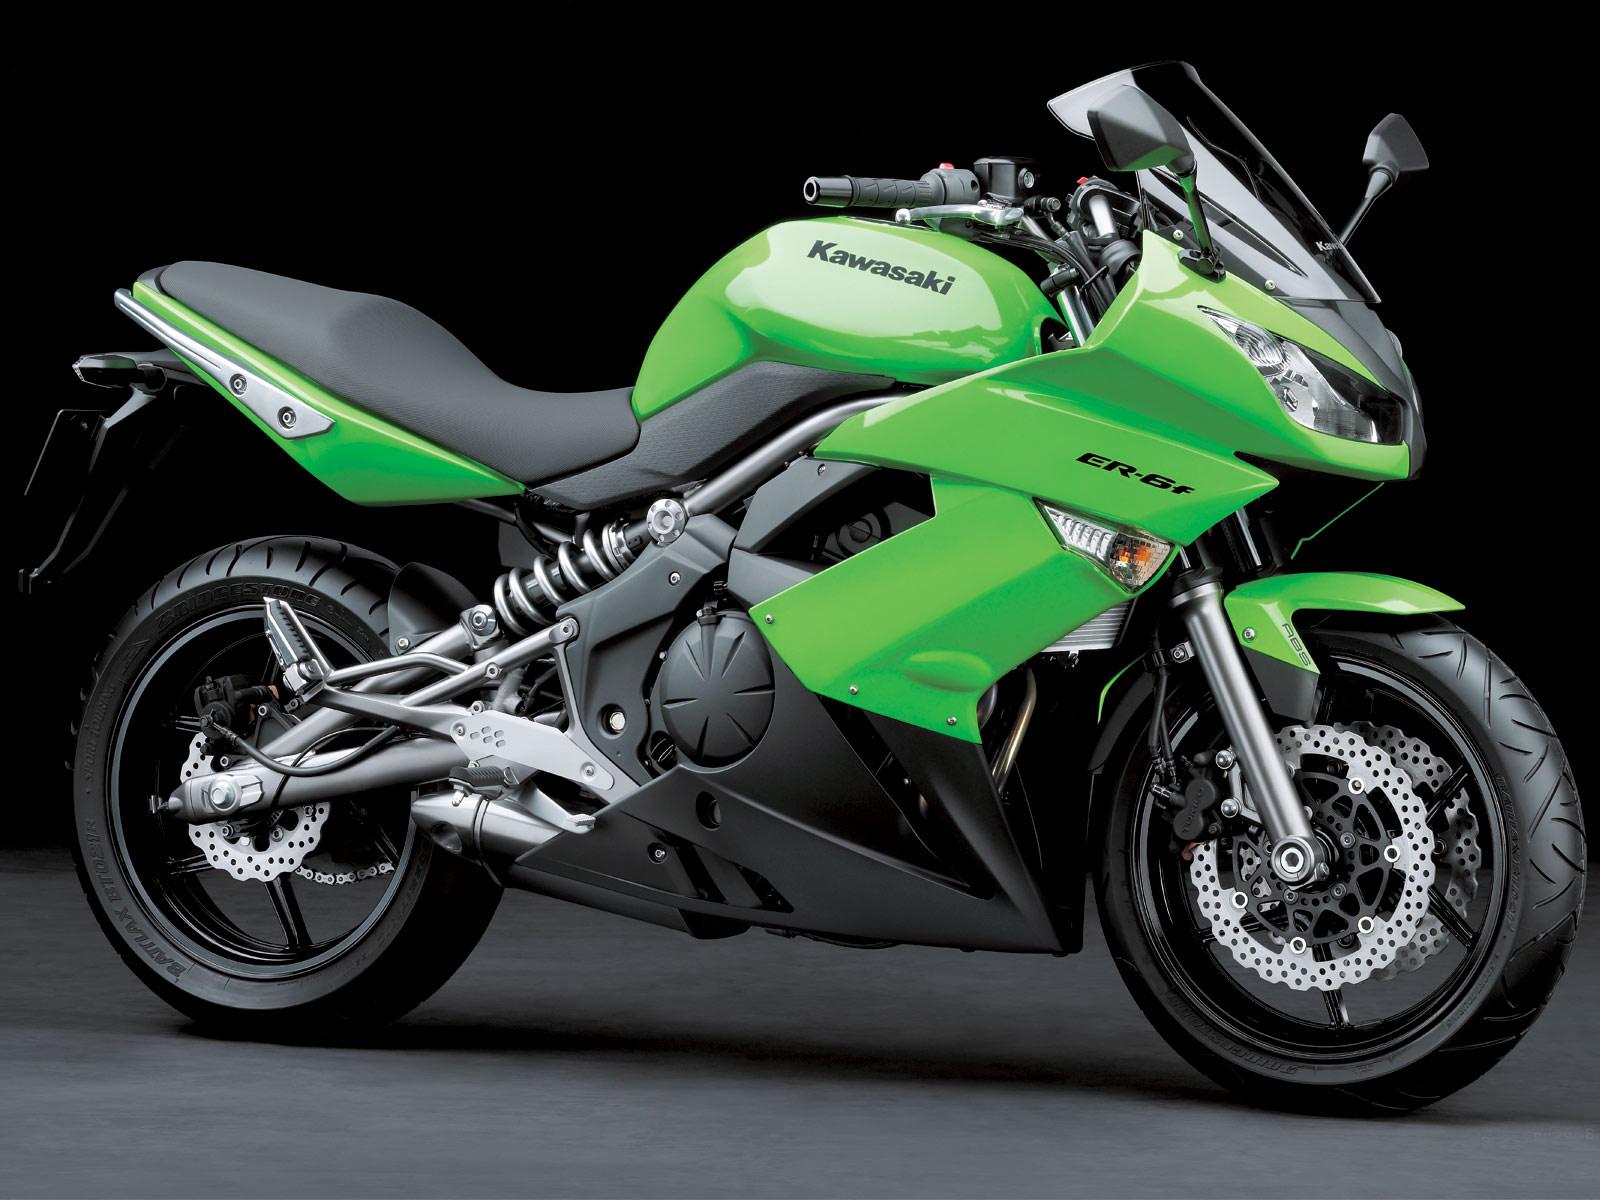 motorcycles sport gambar motor kawasaki er 6f 2009 specs. Black Bedroom Furniture Sets. Home Design Ideas